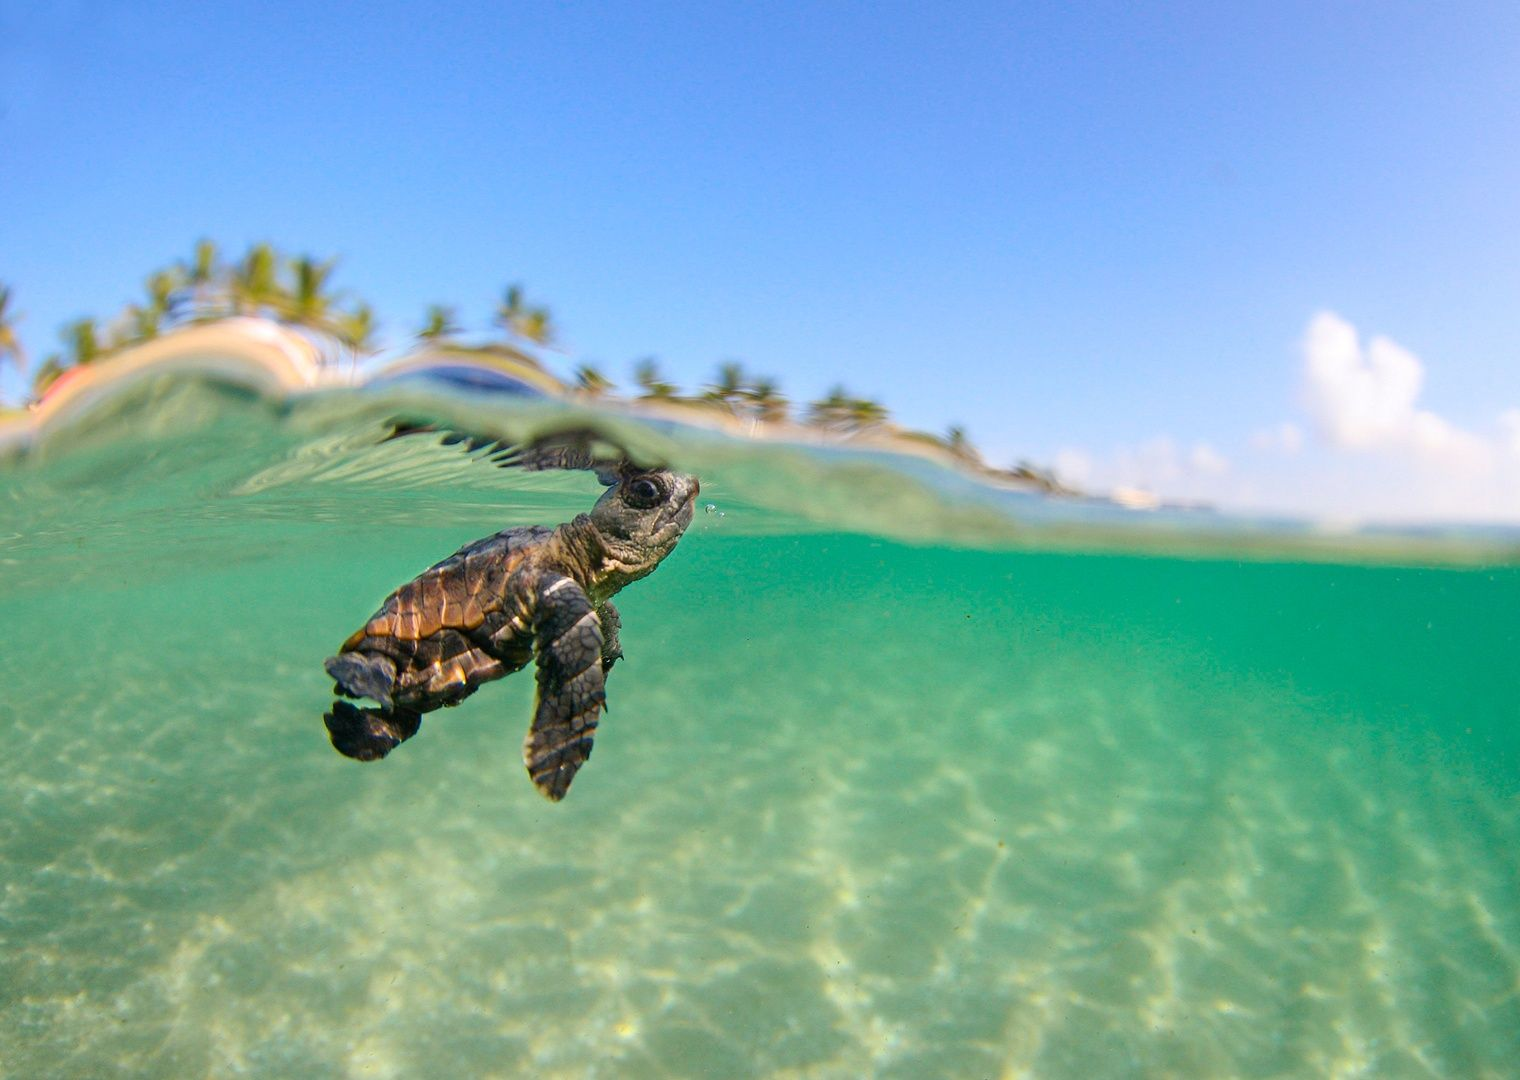 Baby Sea Turtles Wallpapers Wallpaper Cave